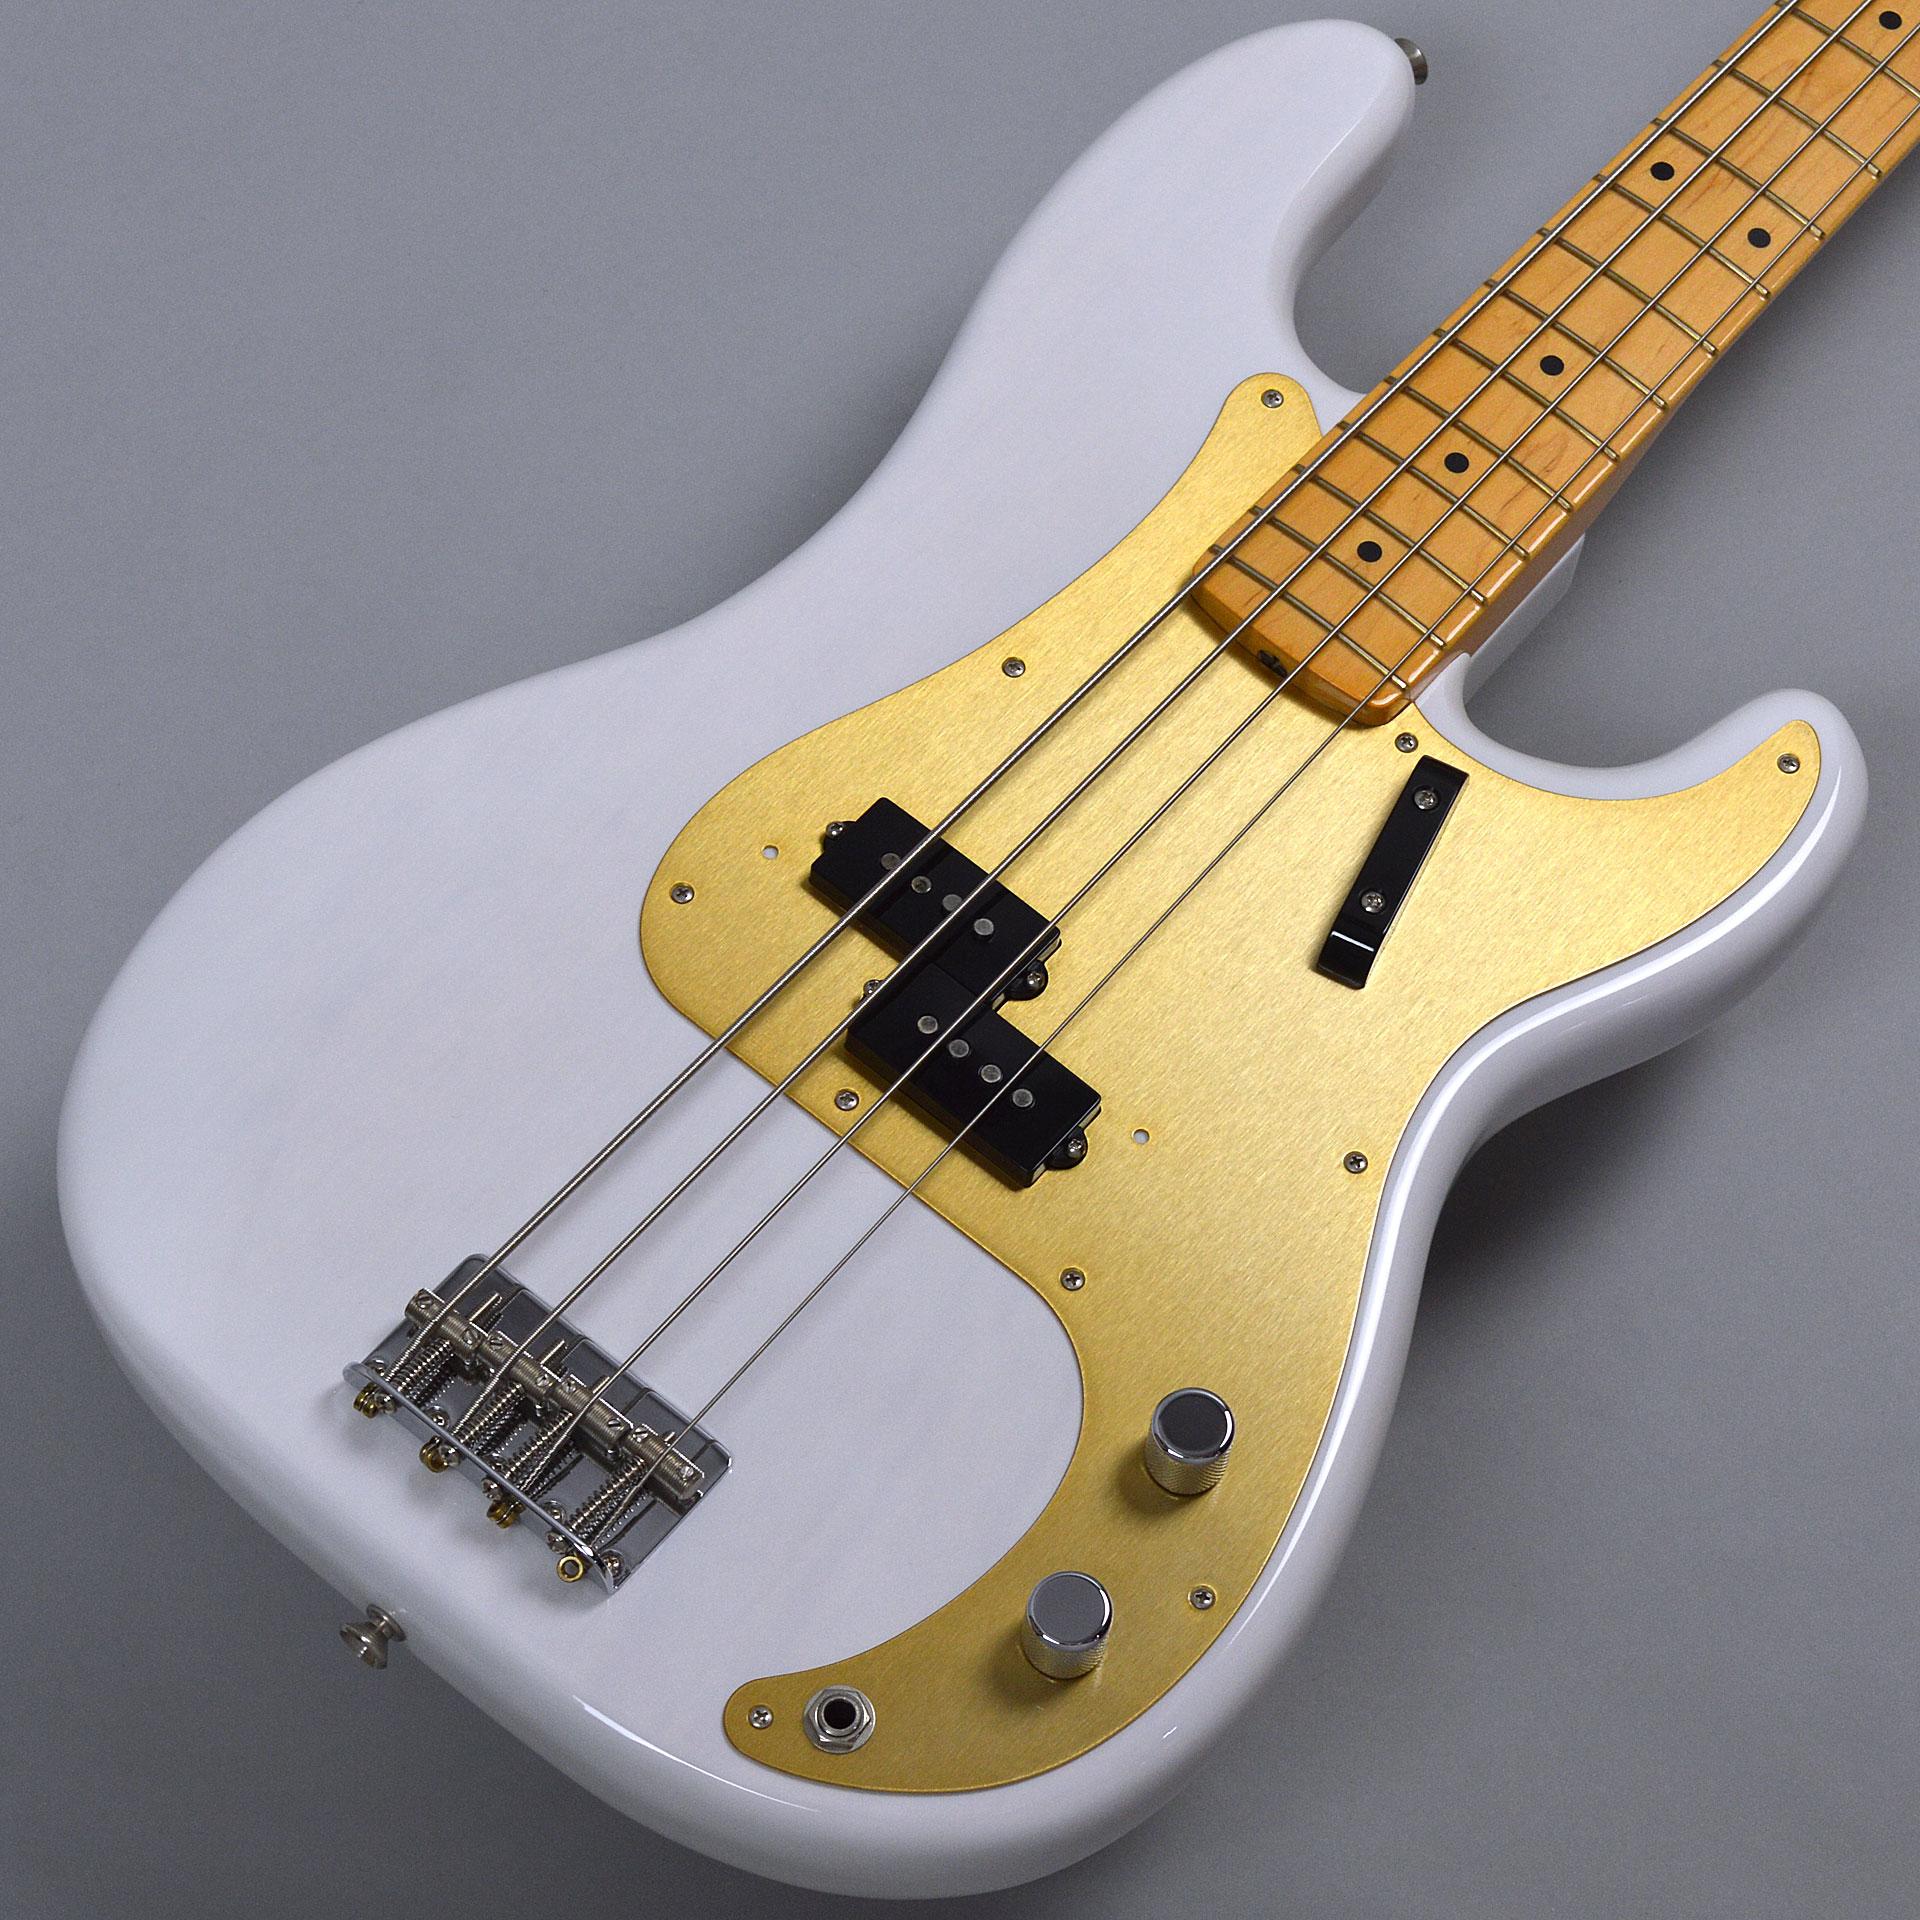 Fender American Original'50s Precision Bass Mapleサムネ画像